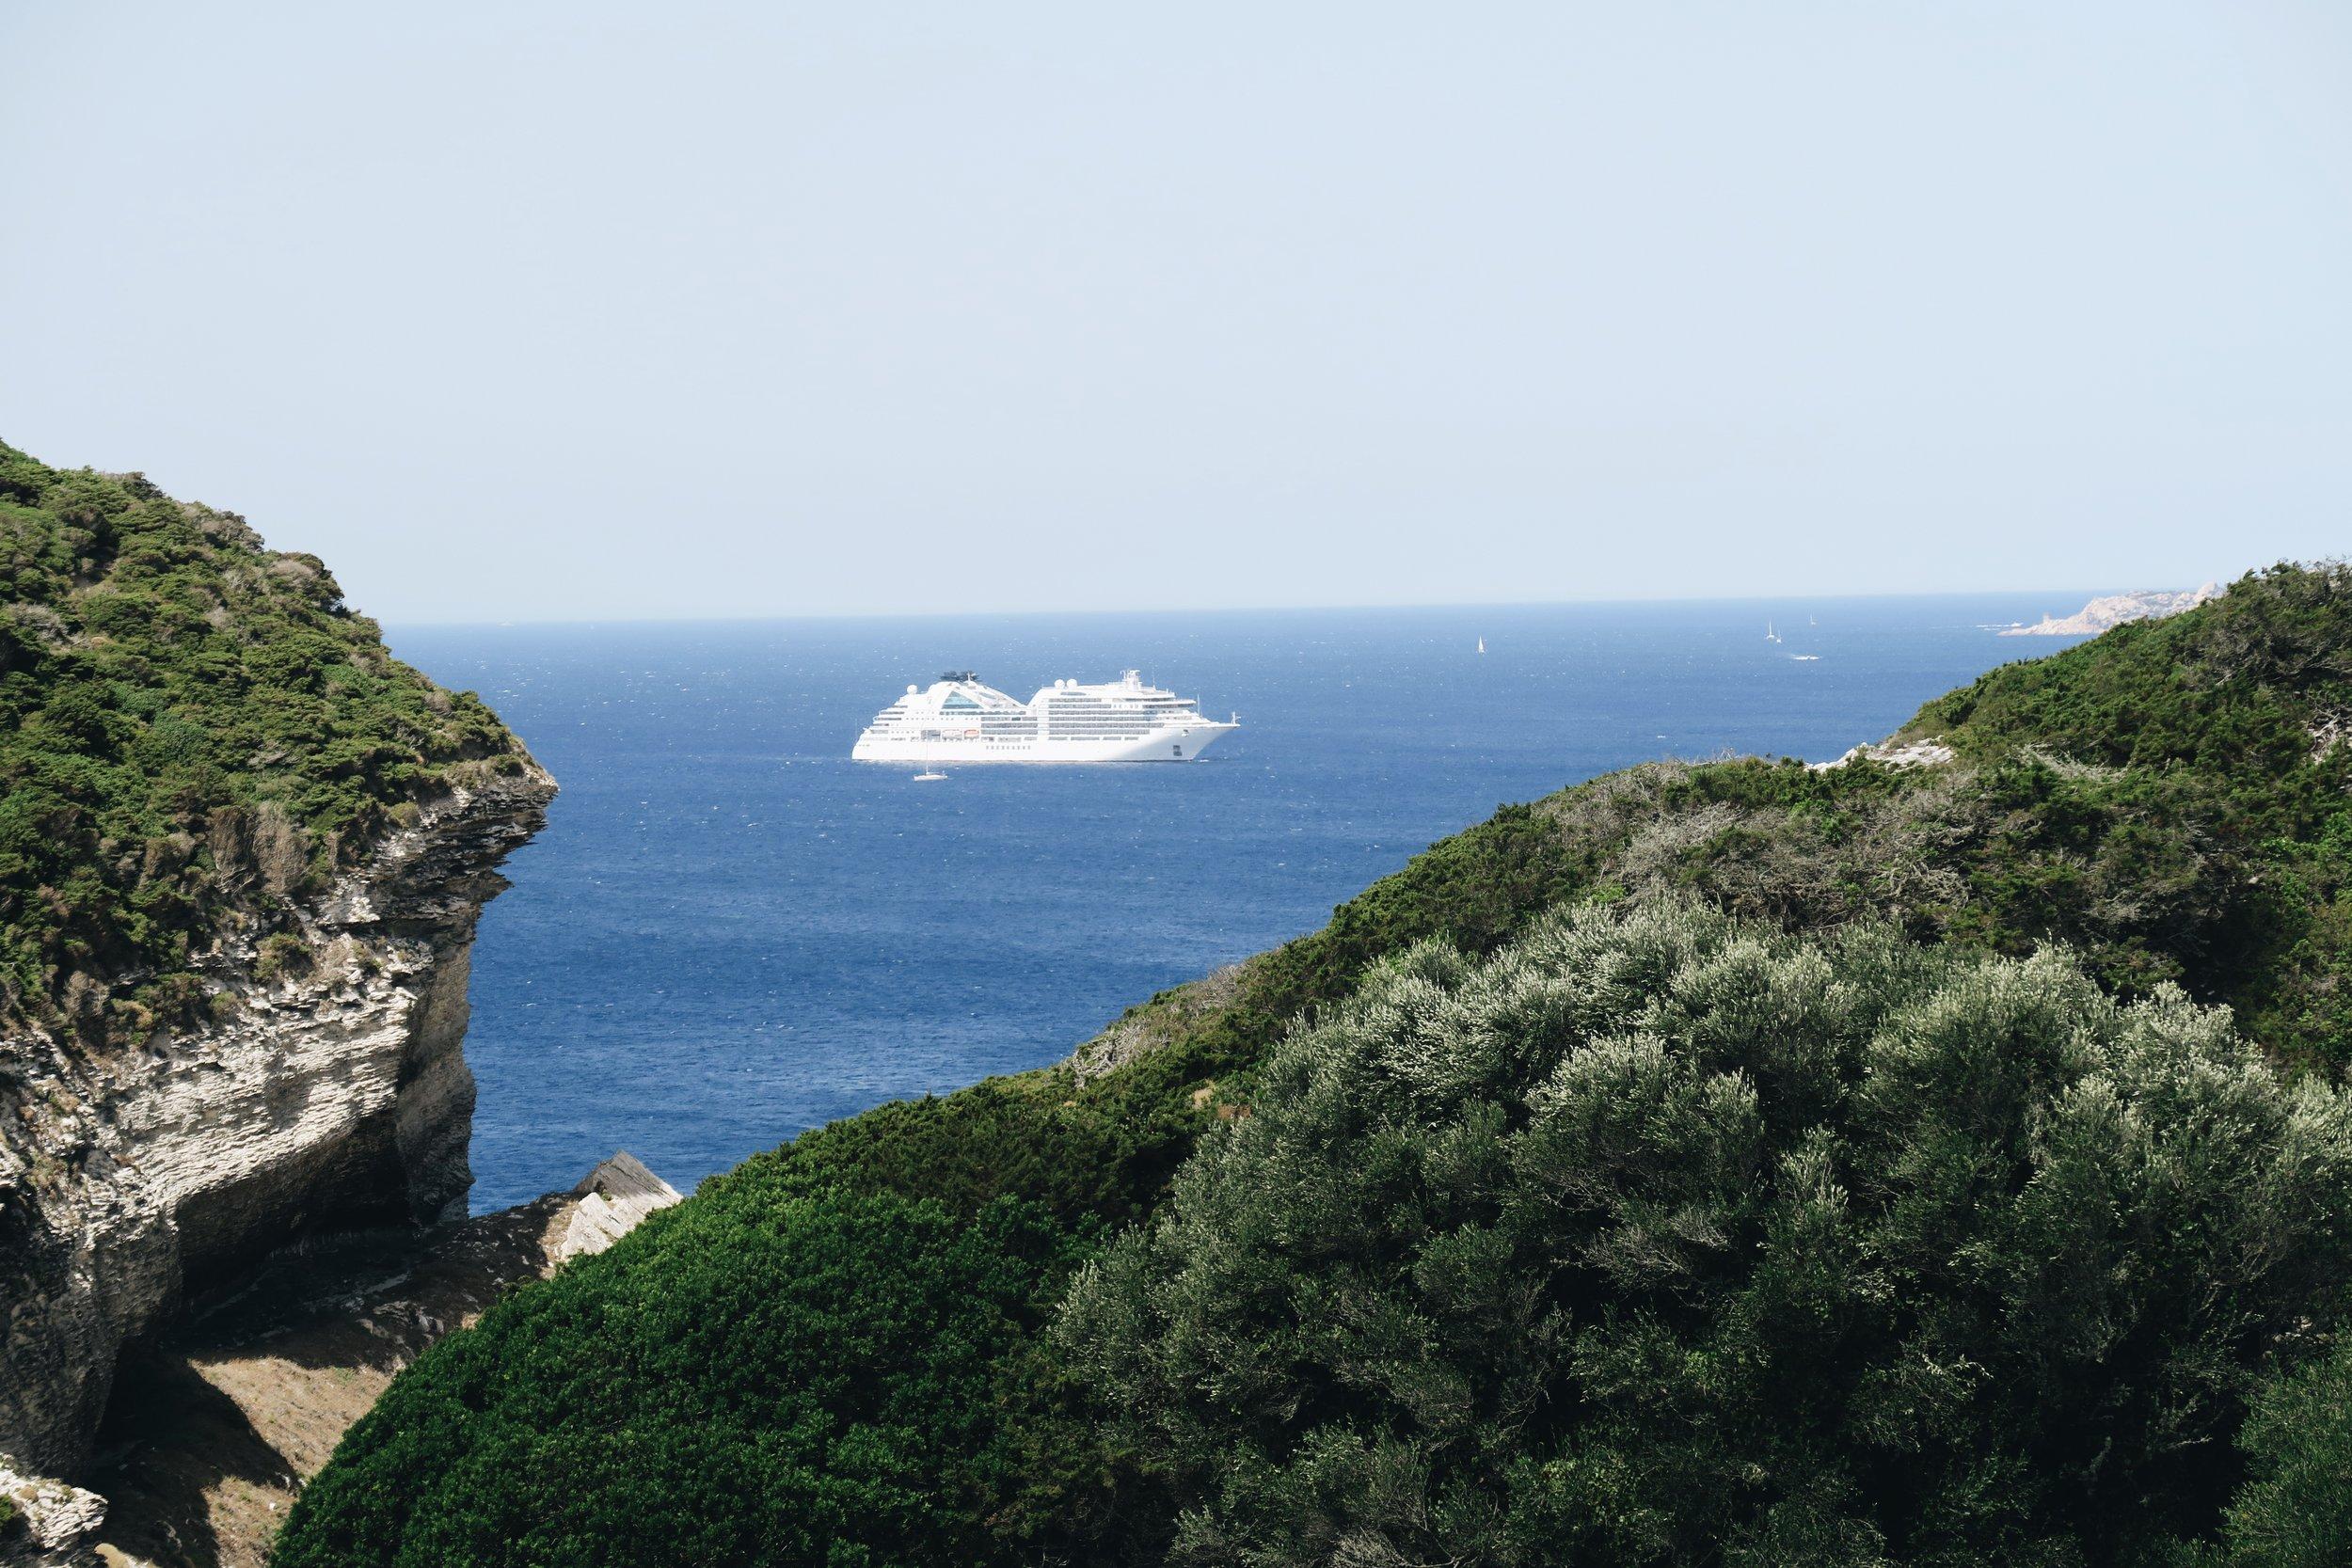 Seabourn Cruise at Corsica Port, Everyday Pursuits, #Pursuigoescruising